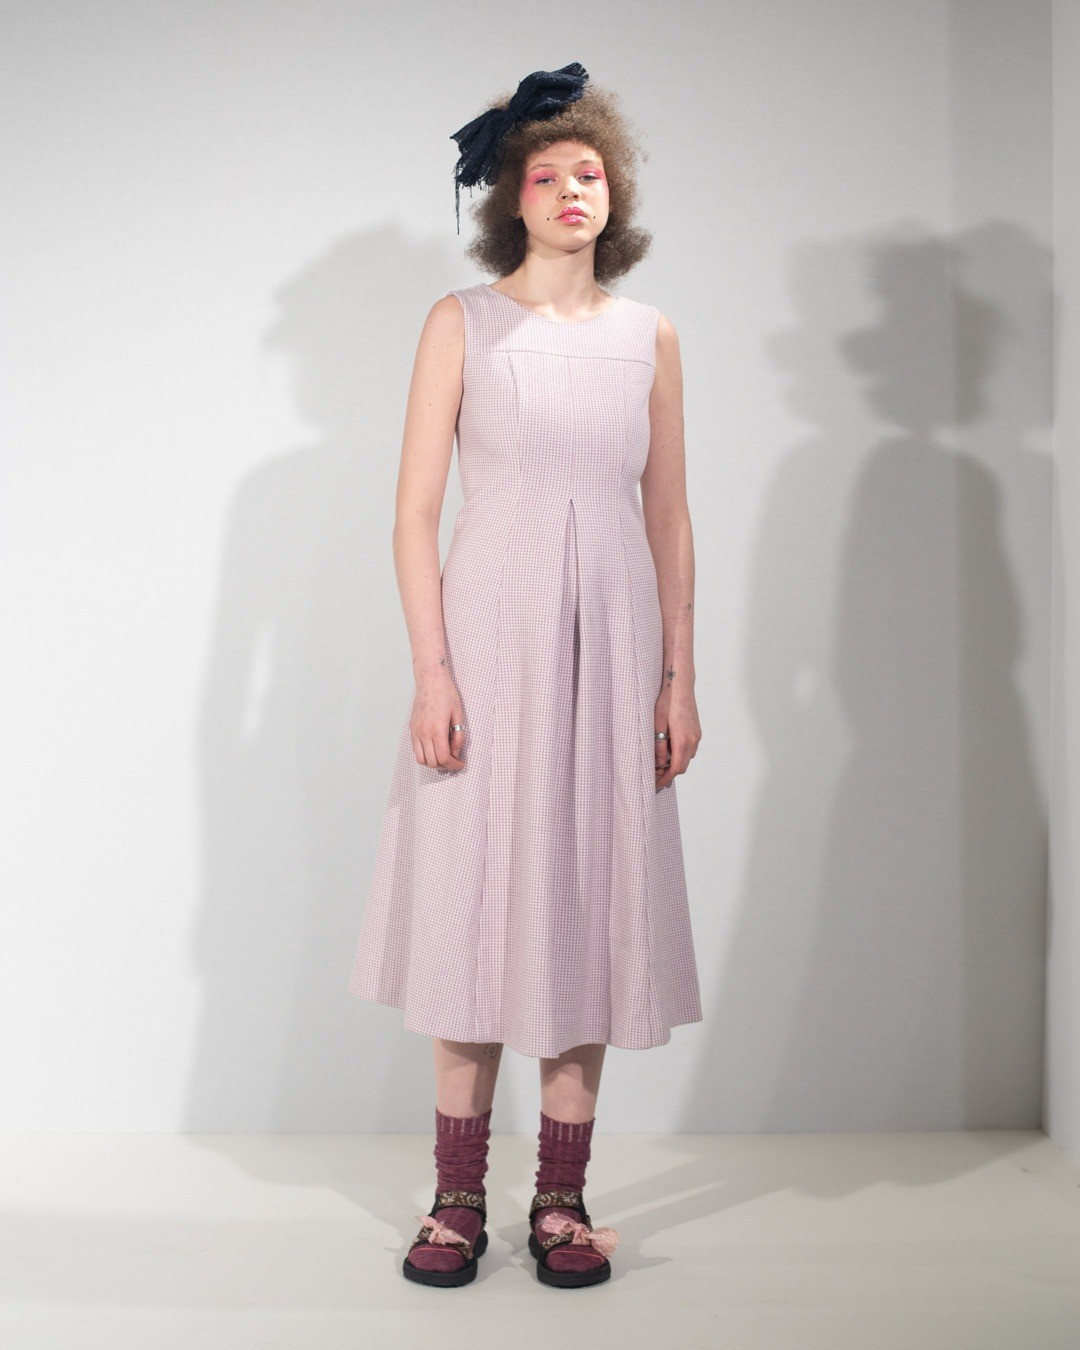 Japanese Fashion Designer